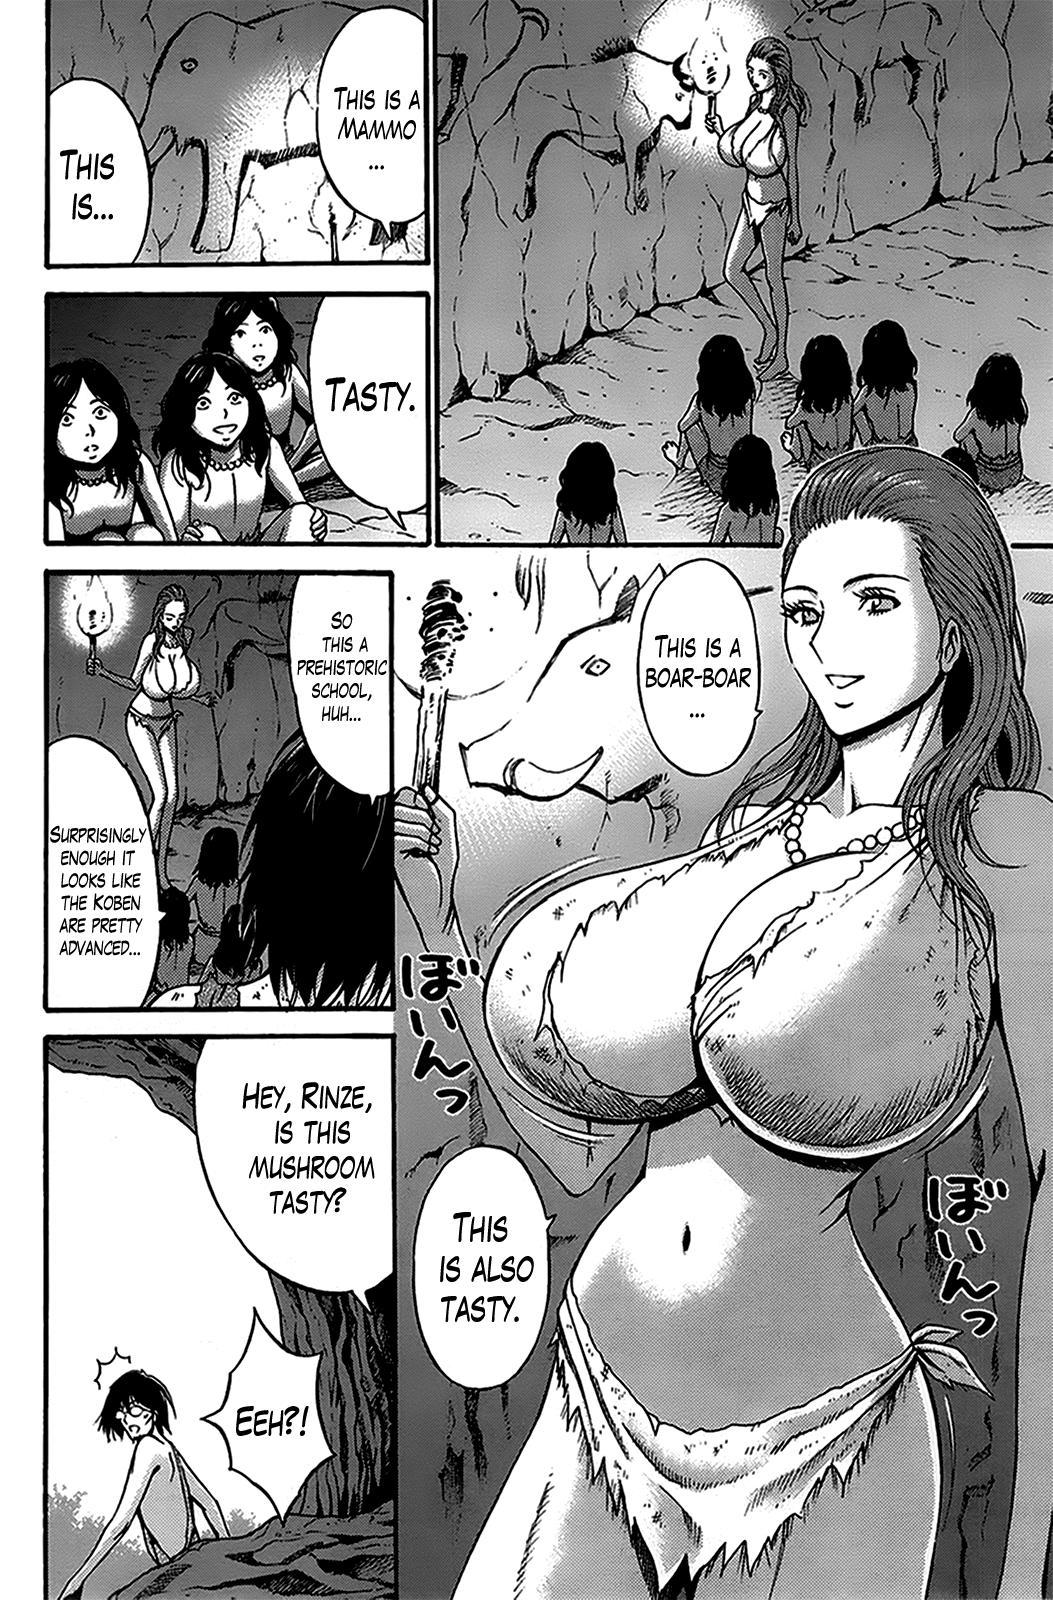 Kigenzen 10000 Nen no Ota | The Otaku in 10,000 B.C. 203